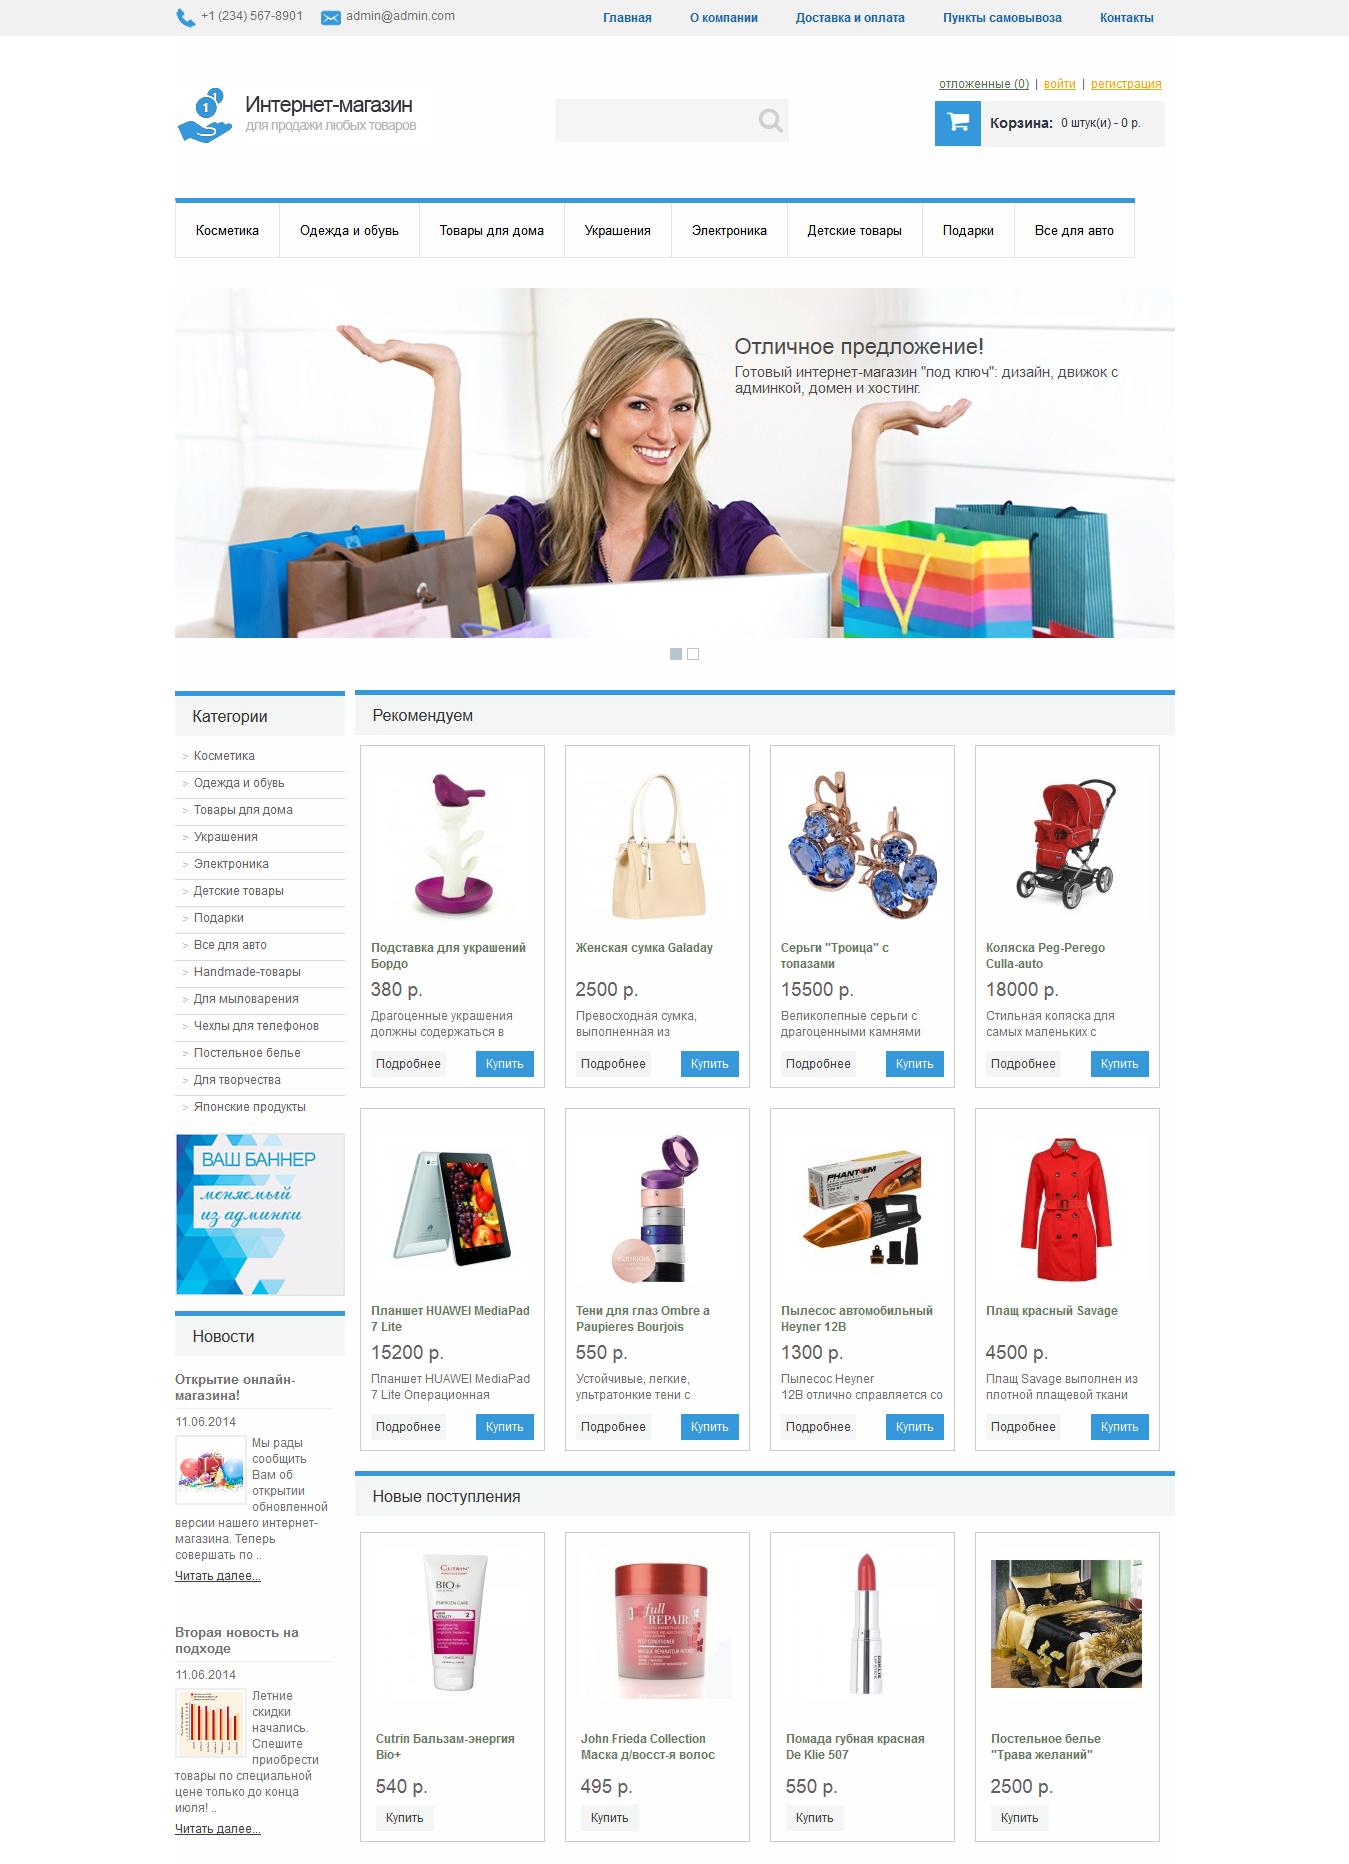 E Commerce Interior Design Opencart Template At A Price